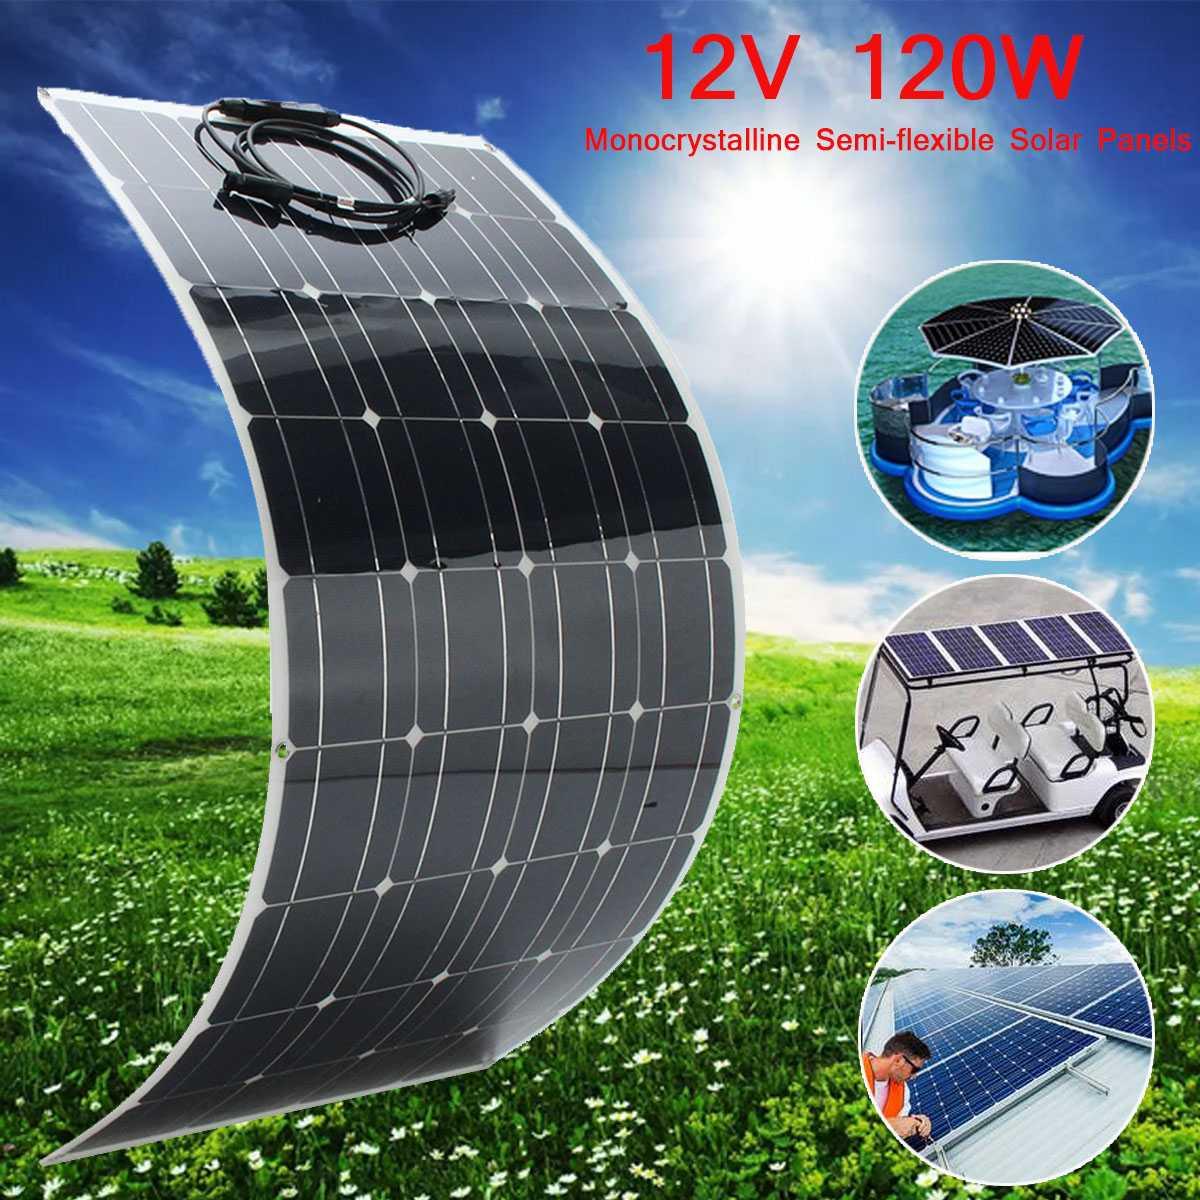 2X SP-39 120W 12V Semi Flexible Monocrystalline Solar Panel Waterproof High Conversion Efficiency Solar Panel + 1.5m Cable